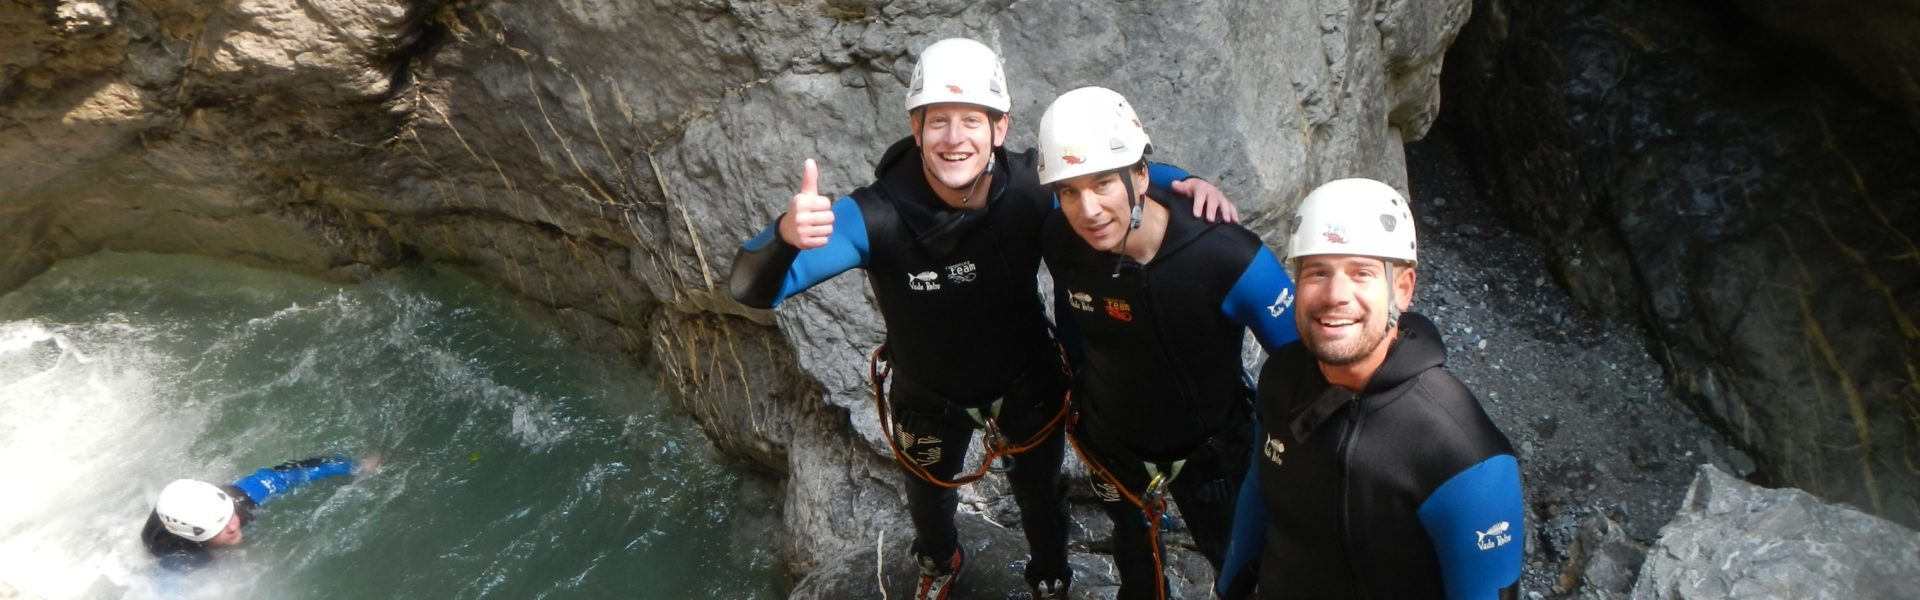 Canyoning in Dornbirn, (c) Canyoning Team Vorarlberg